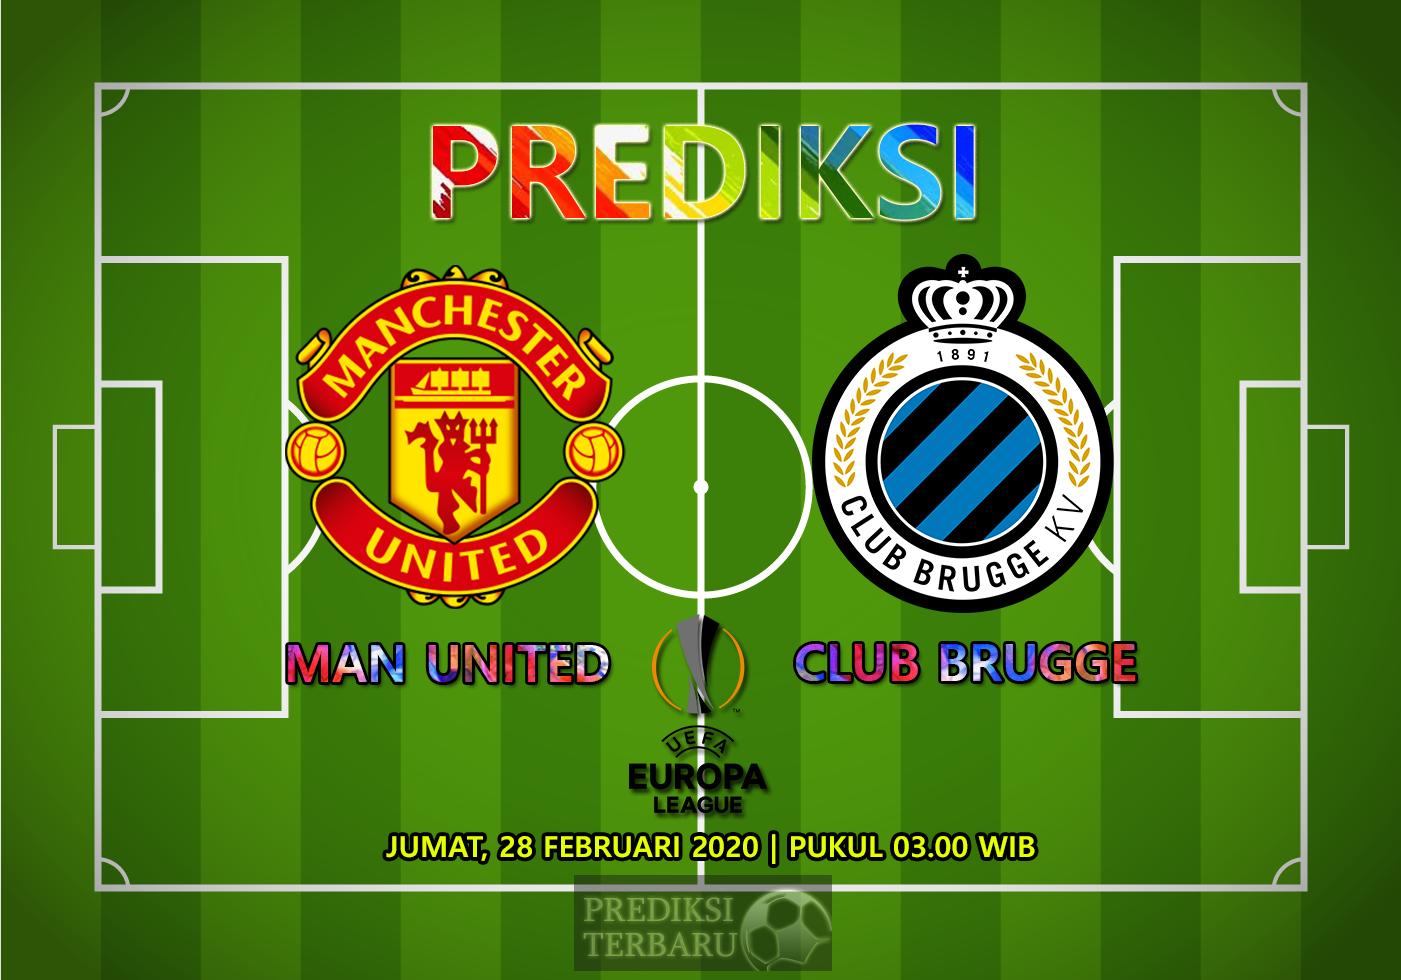 Prediksi Manchester United Vs Club Brugge Jumat 28 Februari